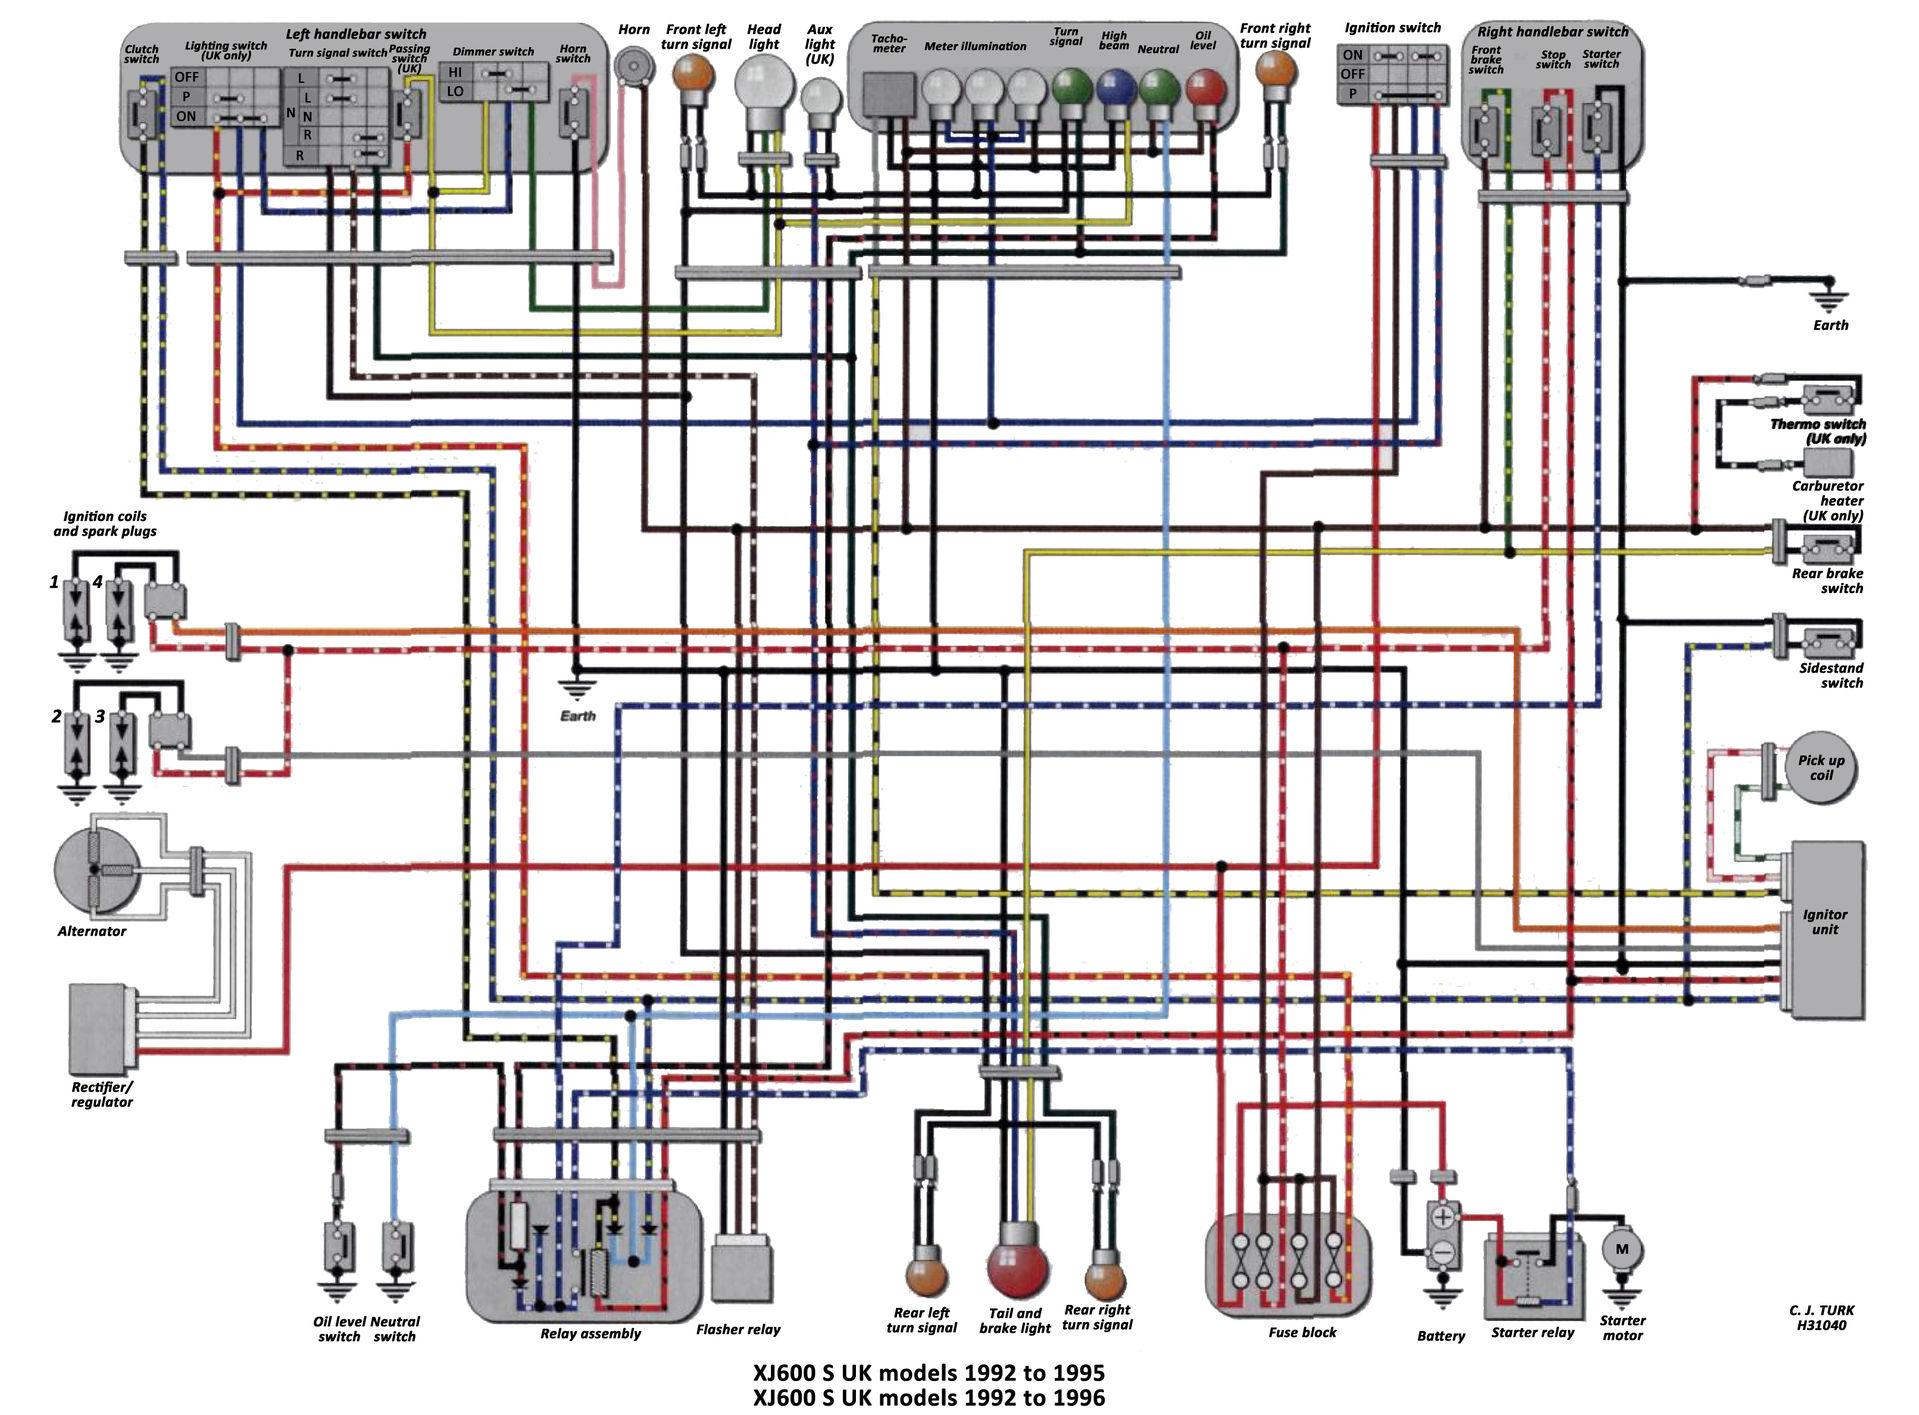 hight resolution of yamaha vx wiring diagram wiring diagram dat vx 600 wiring diagram wiring diagram forward yamaha vx